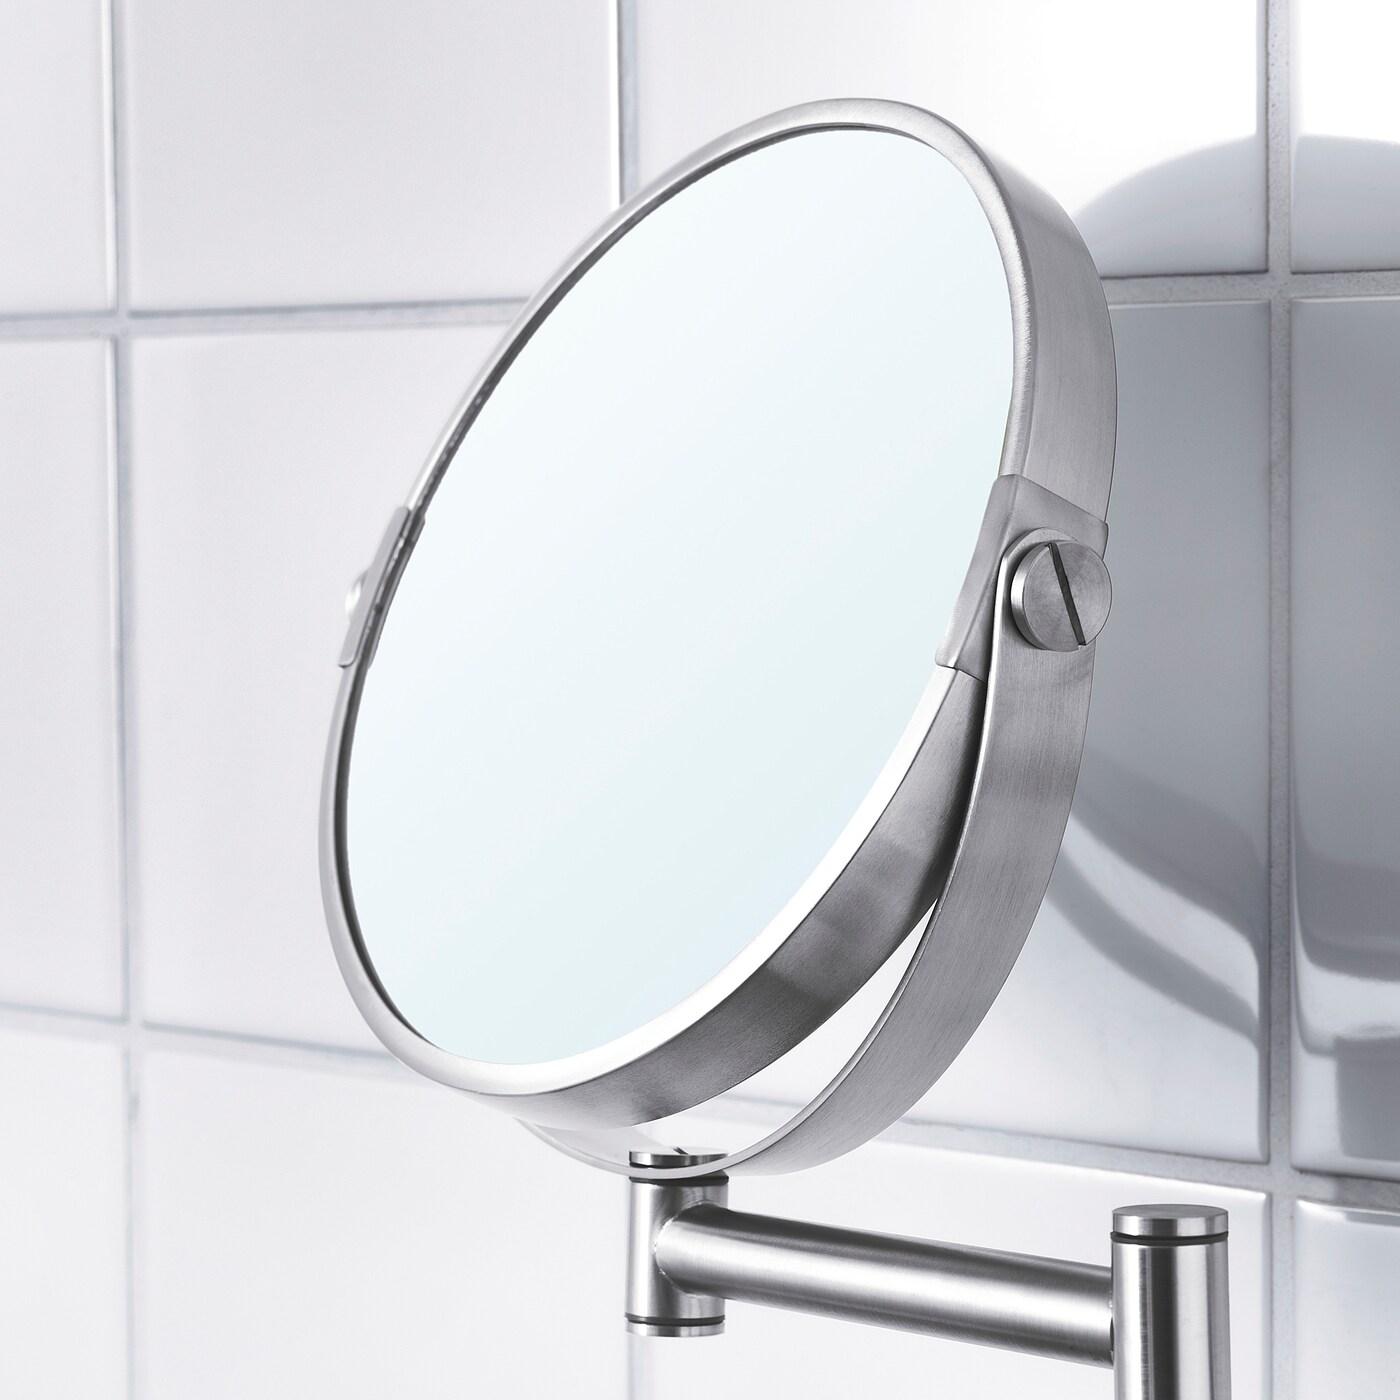 Brogrund Spejl Rustfrit Stal 3x27 Cm Ikea